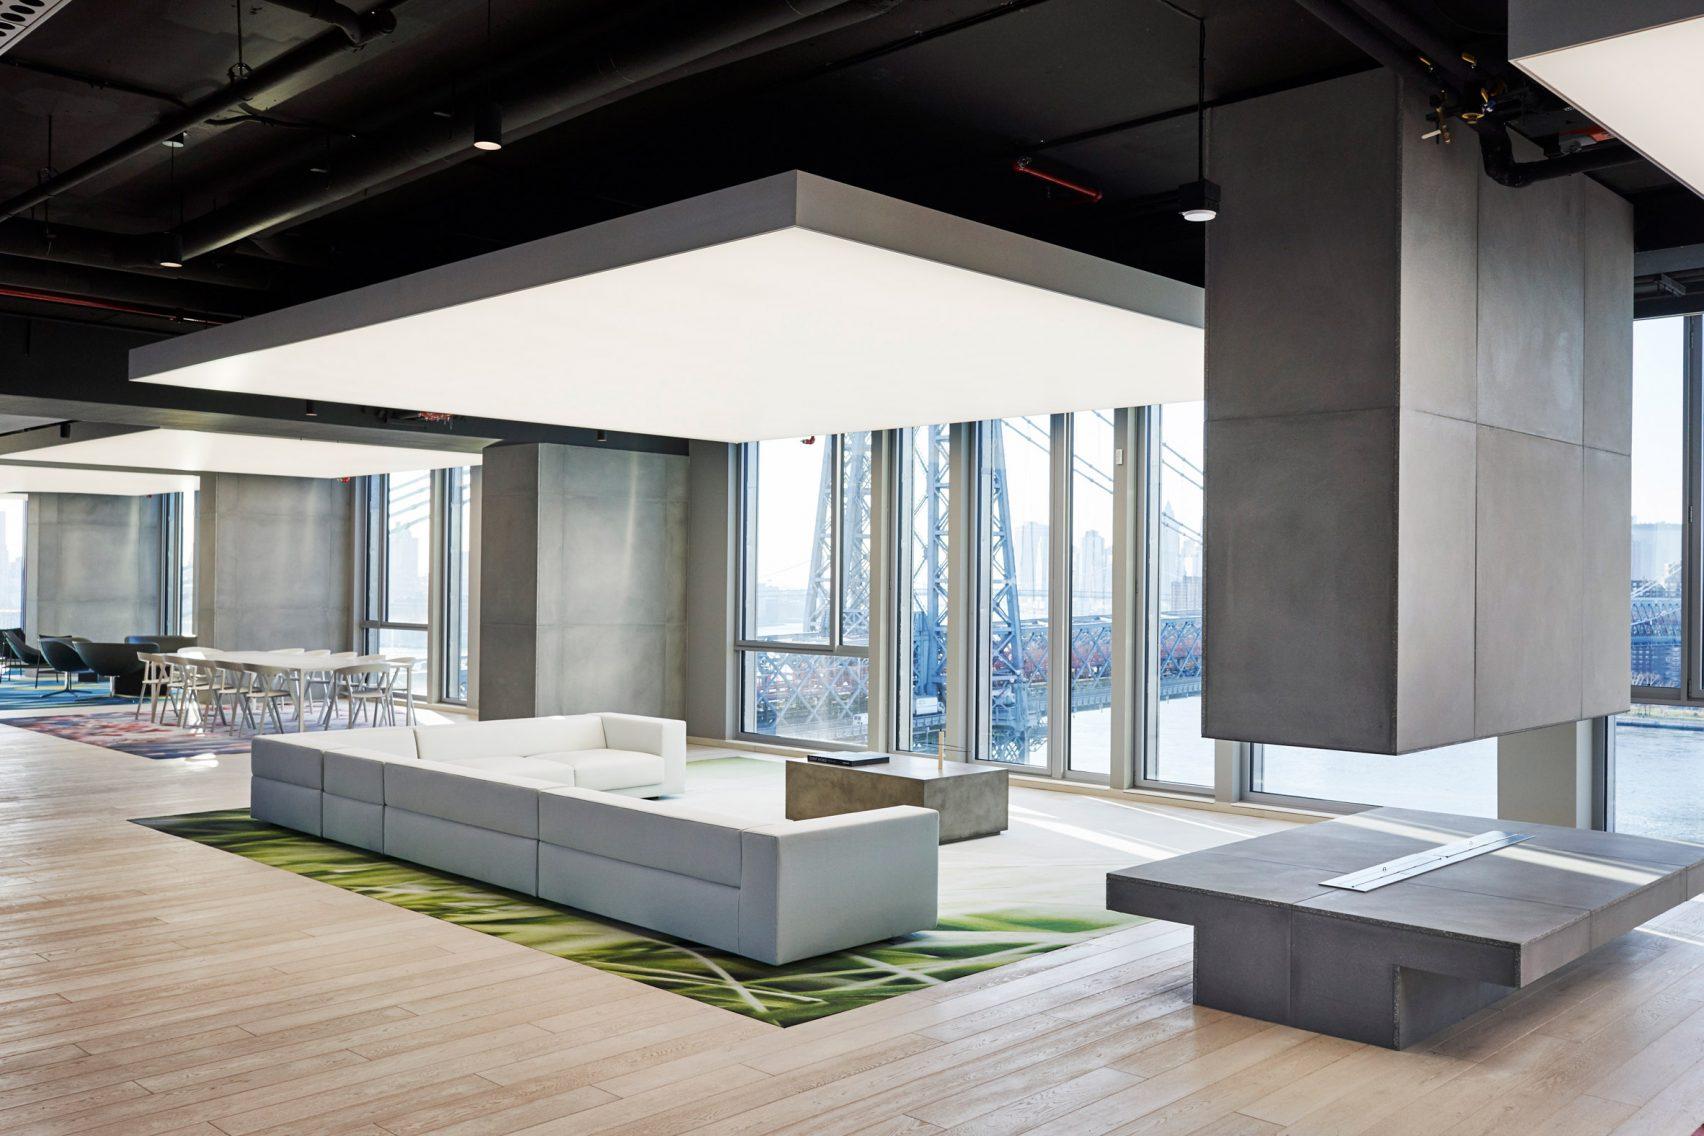 325-kent-shop-architects-brooklyn-noko-06.jpg